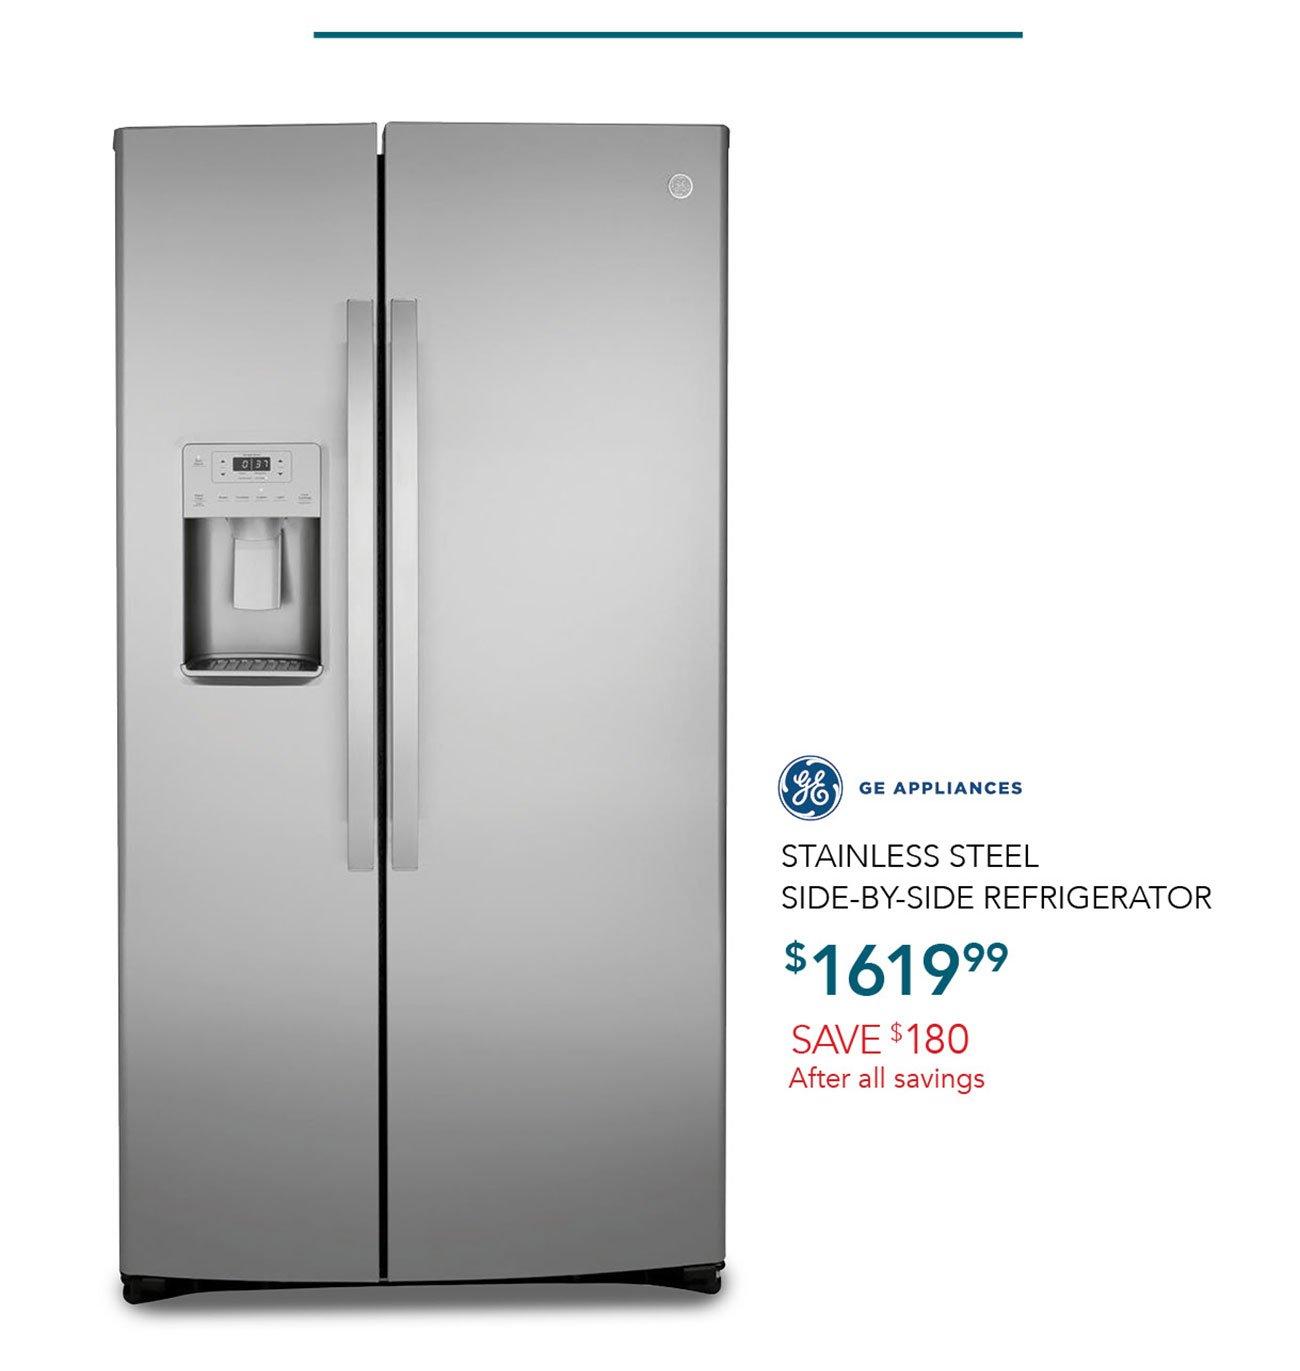 GE-Stainless-steel-refrigerator